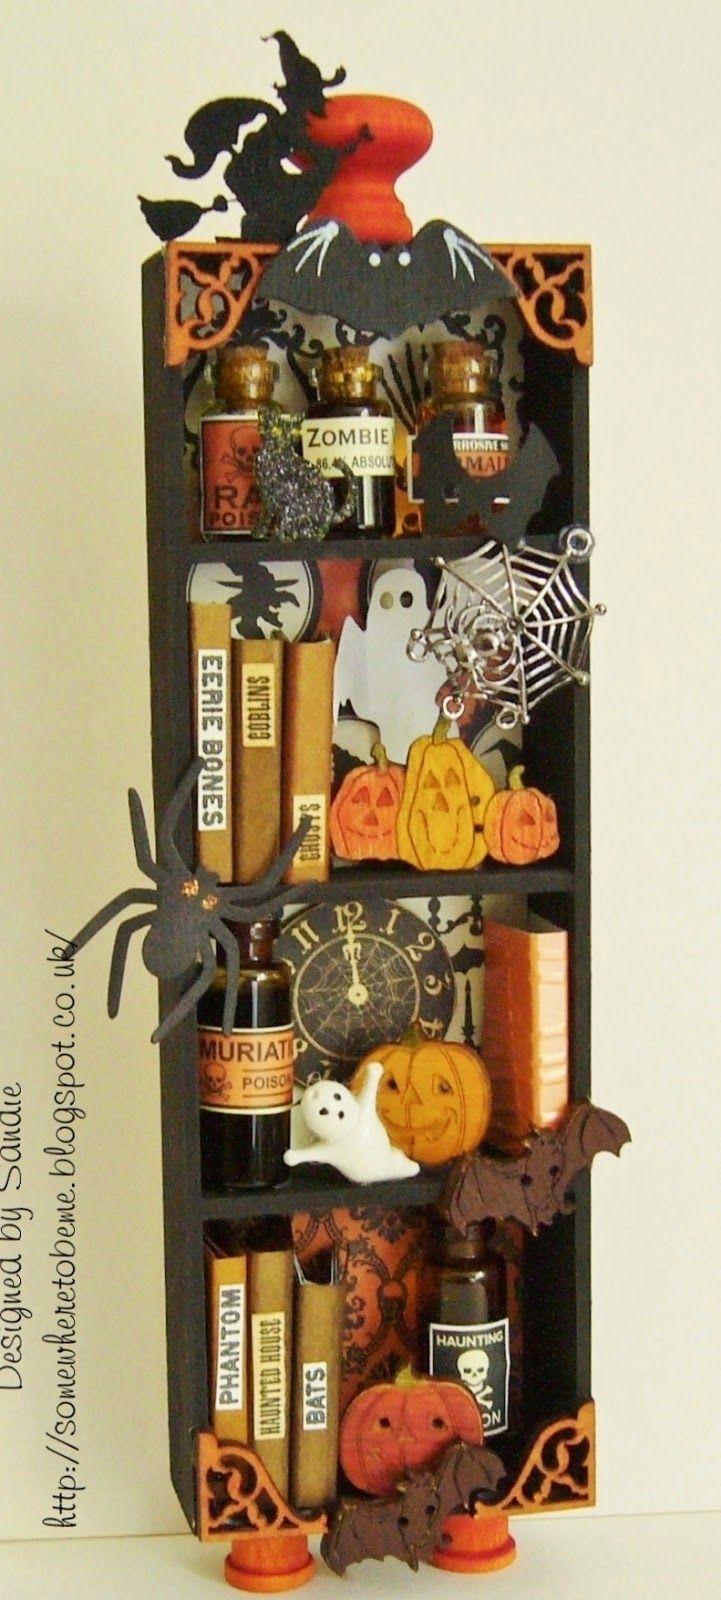 best 25 halloween shadow box ideas only on pinterest vintage halloween decorations curiosity. Black Bedroom Furniture Sets. Home Design Ideas